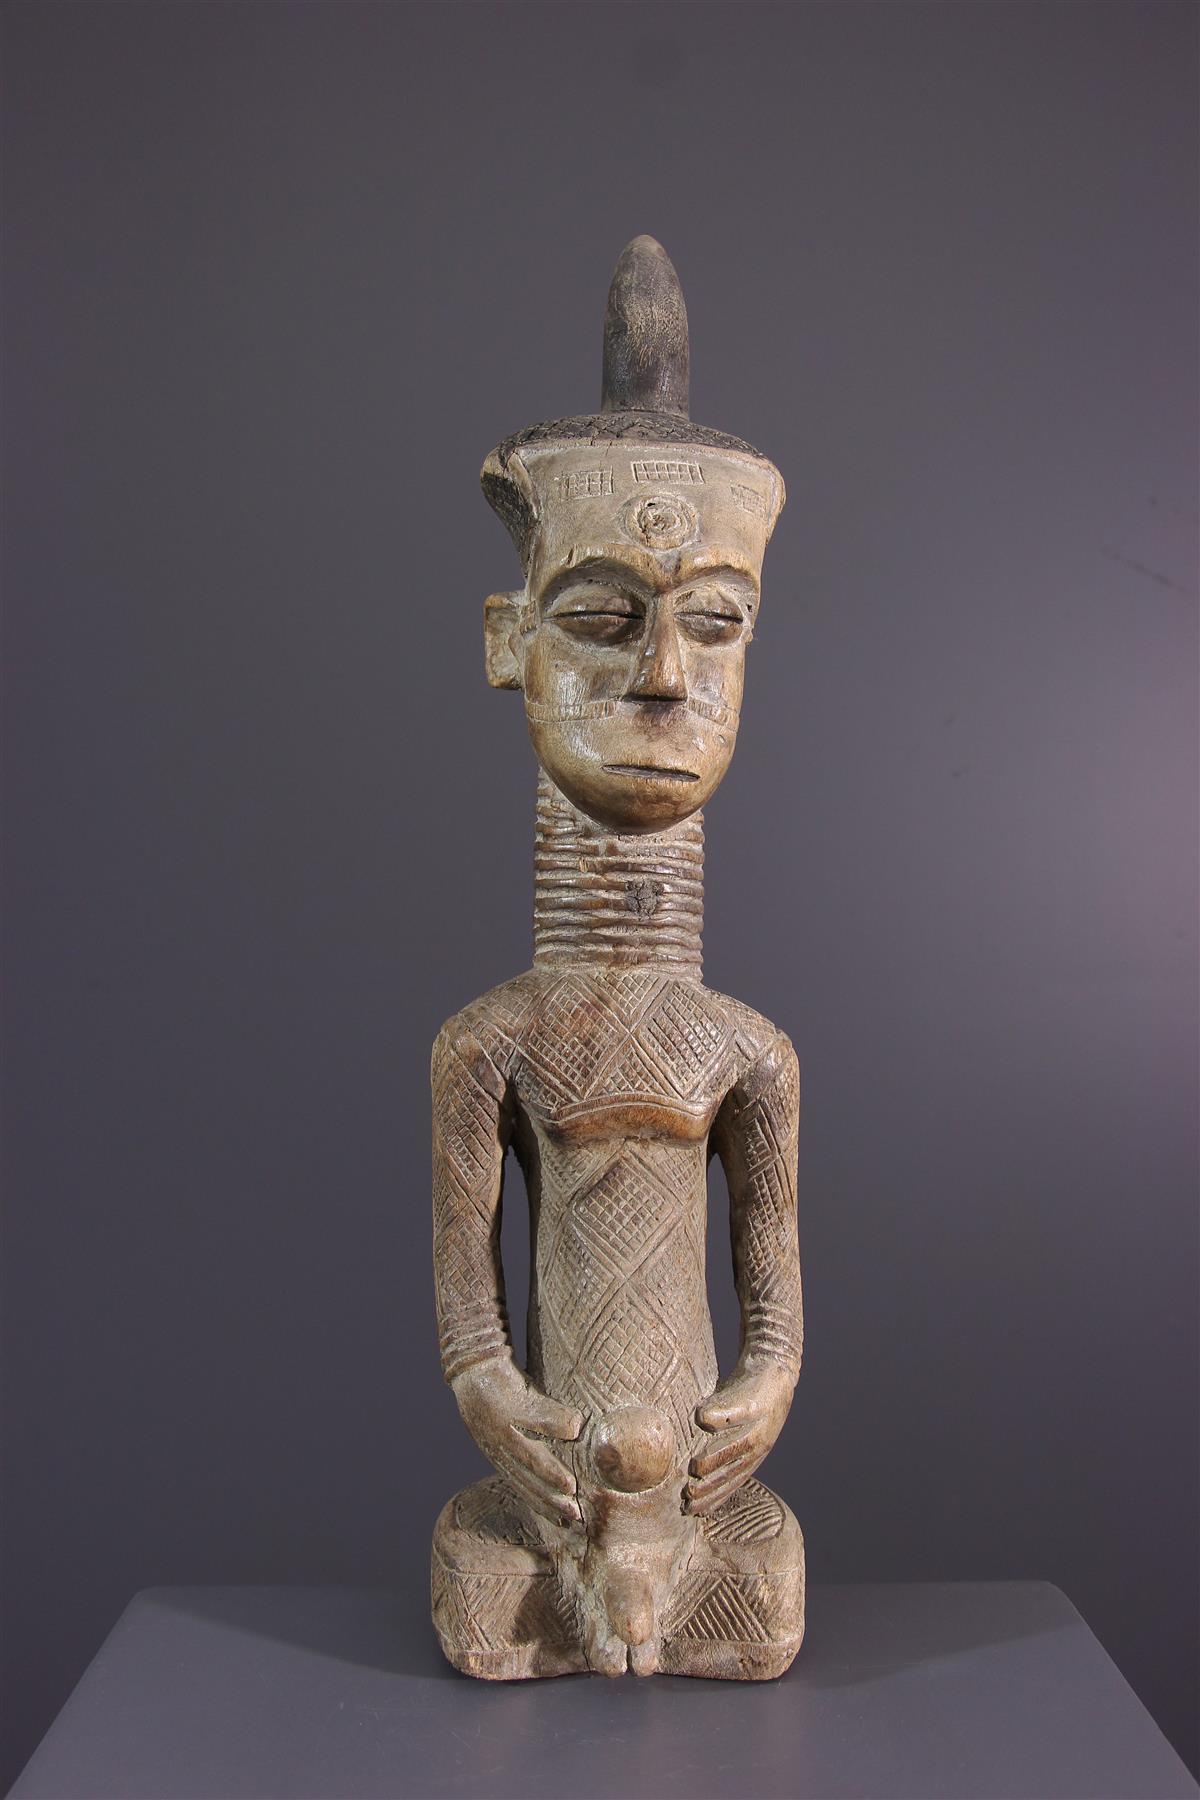 Statuette Dengese - African art